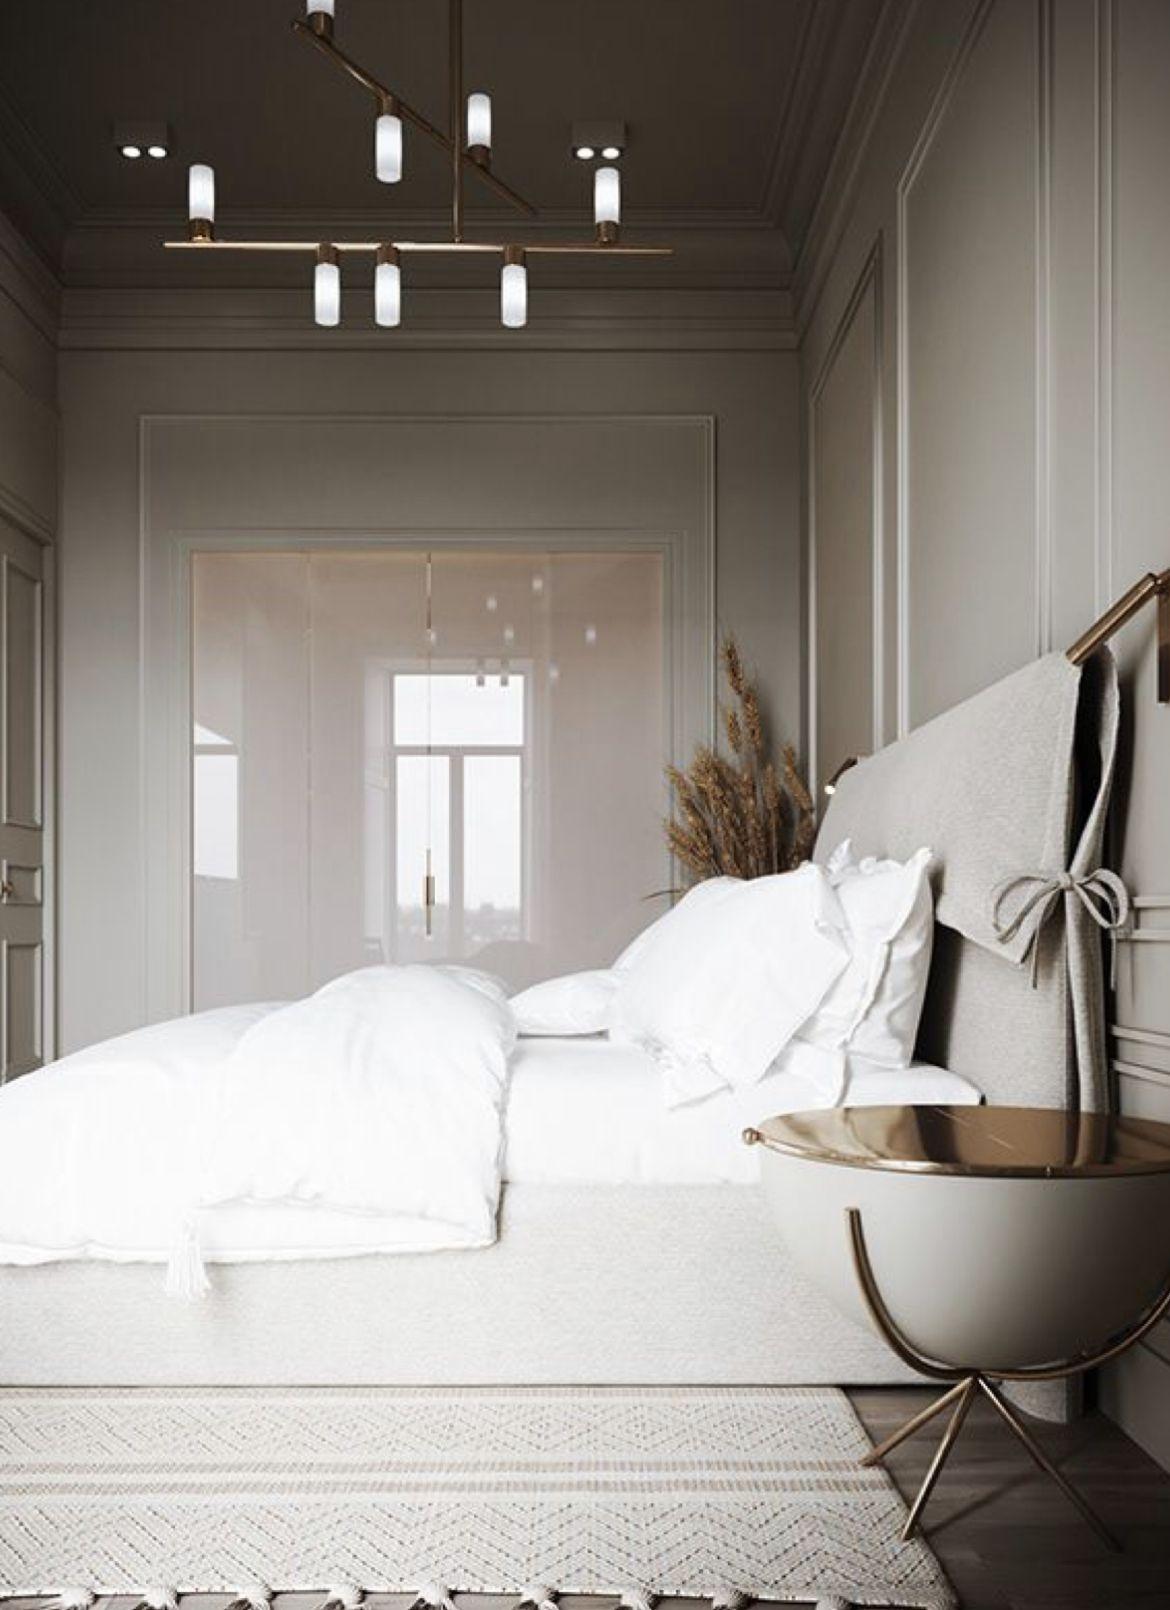 P A N E L B E D Bedroom Interior House Interior Luxurious Bedrooms